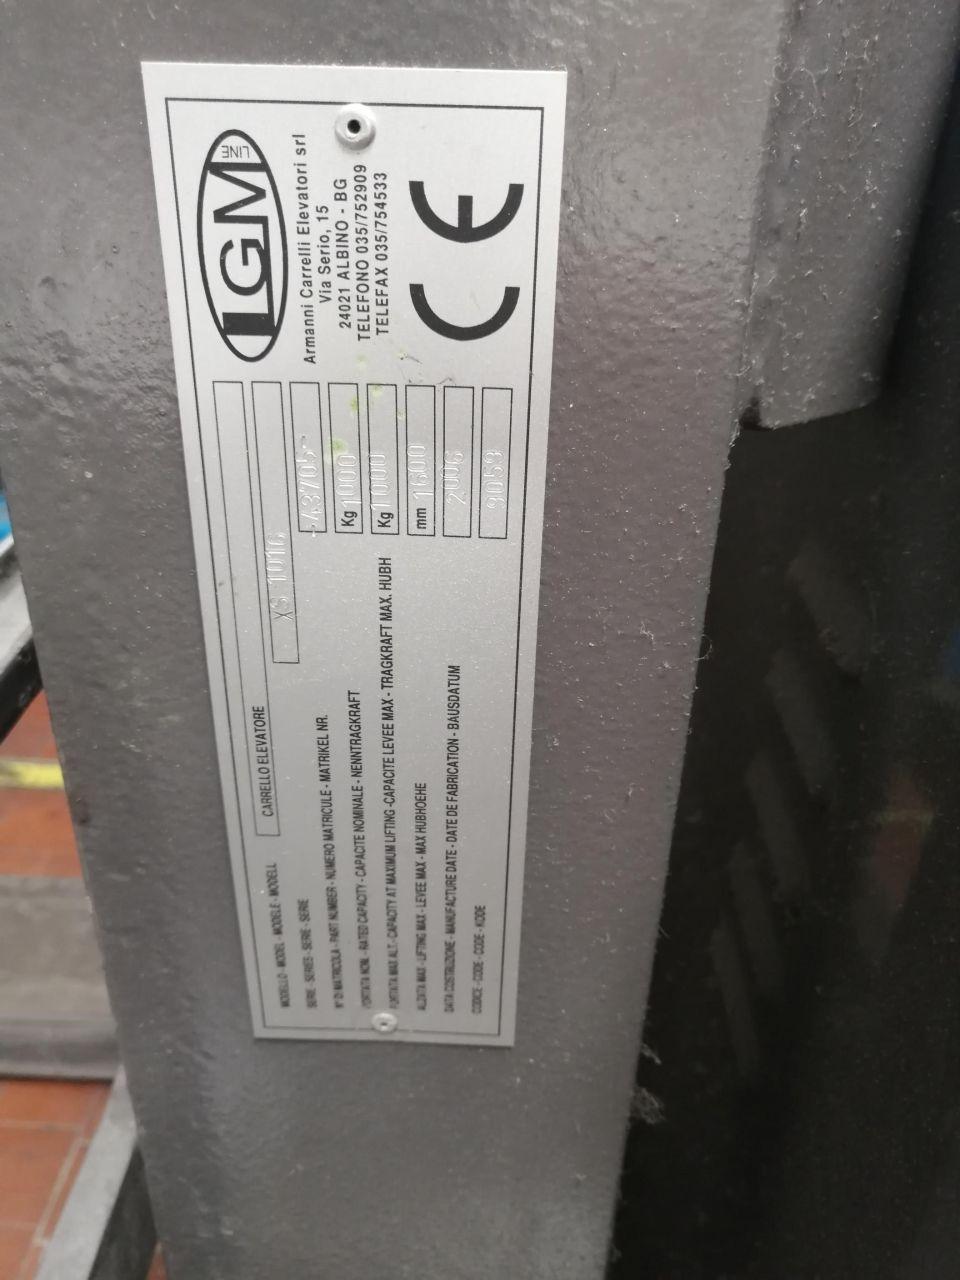 HANDLING-MATERIAL ELECTRIC PALLET TRUCK, 年份: 2006, ref.68308 | www.coci-sa.com/cn | 68308n_5.jpg